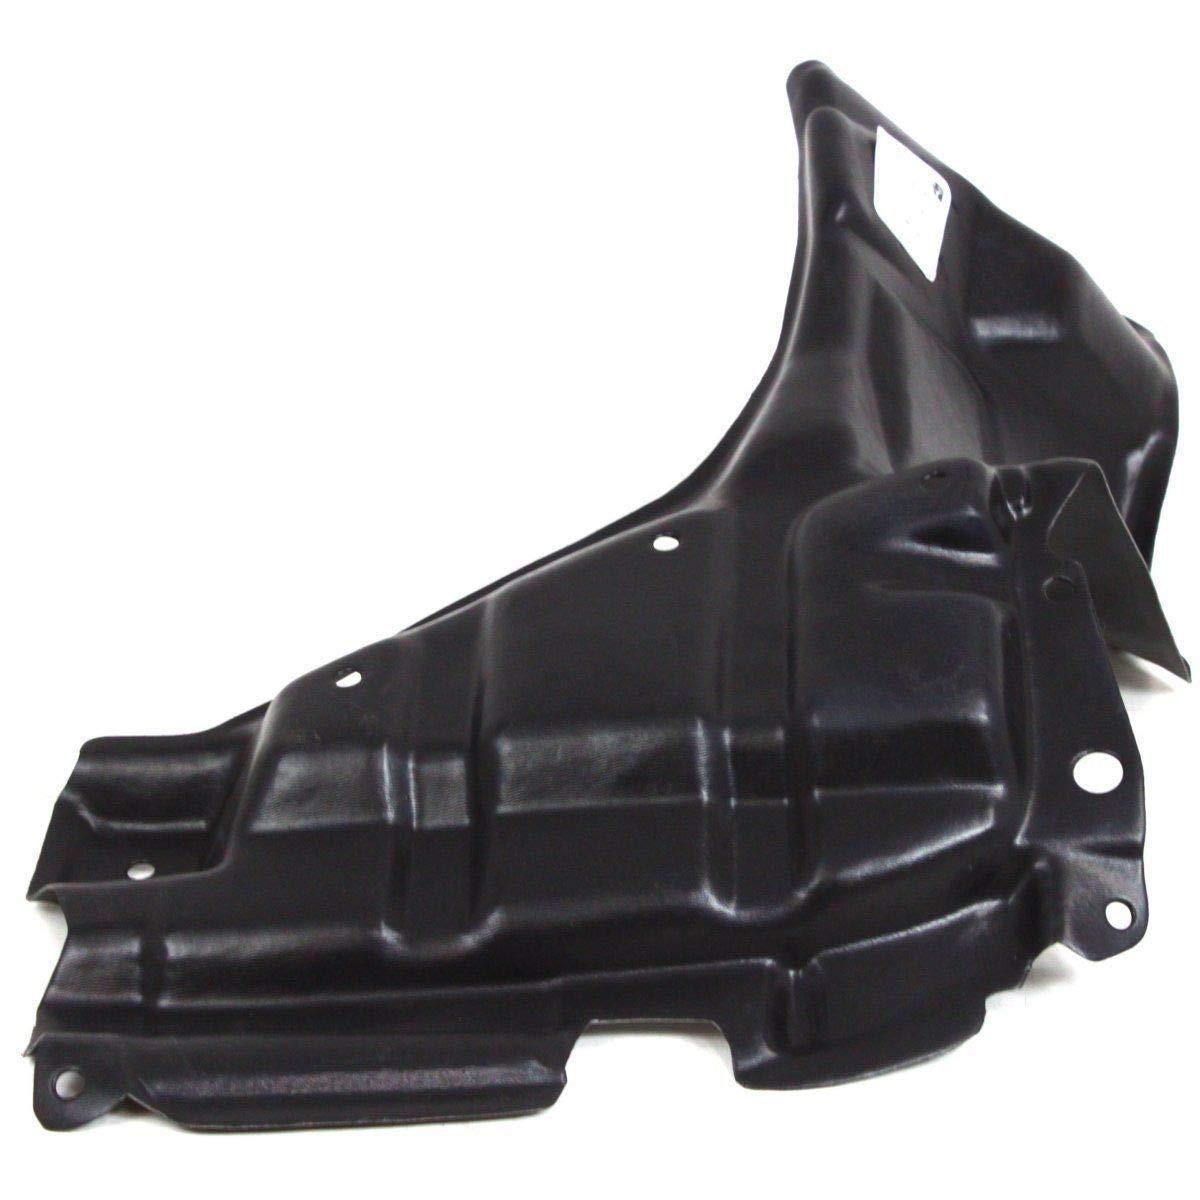 KA LEGEND Splash Shield Guard Engine Under Cover for 07-12 Toyota Yaris TO1228139 5144252110